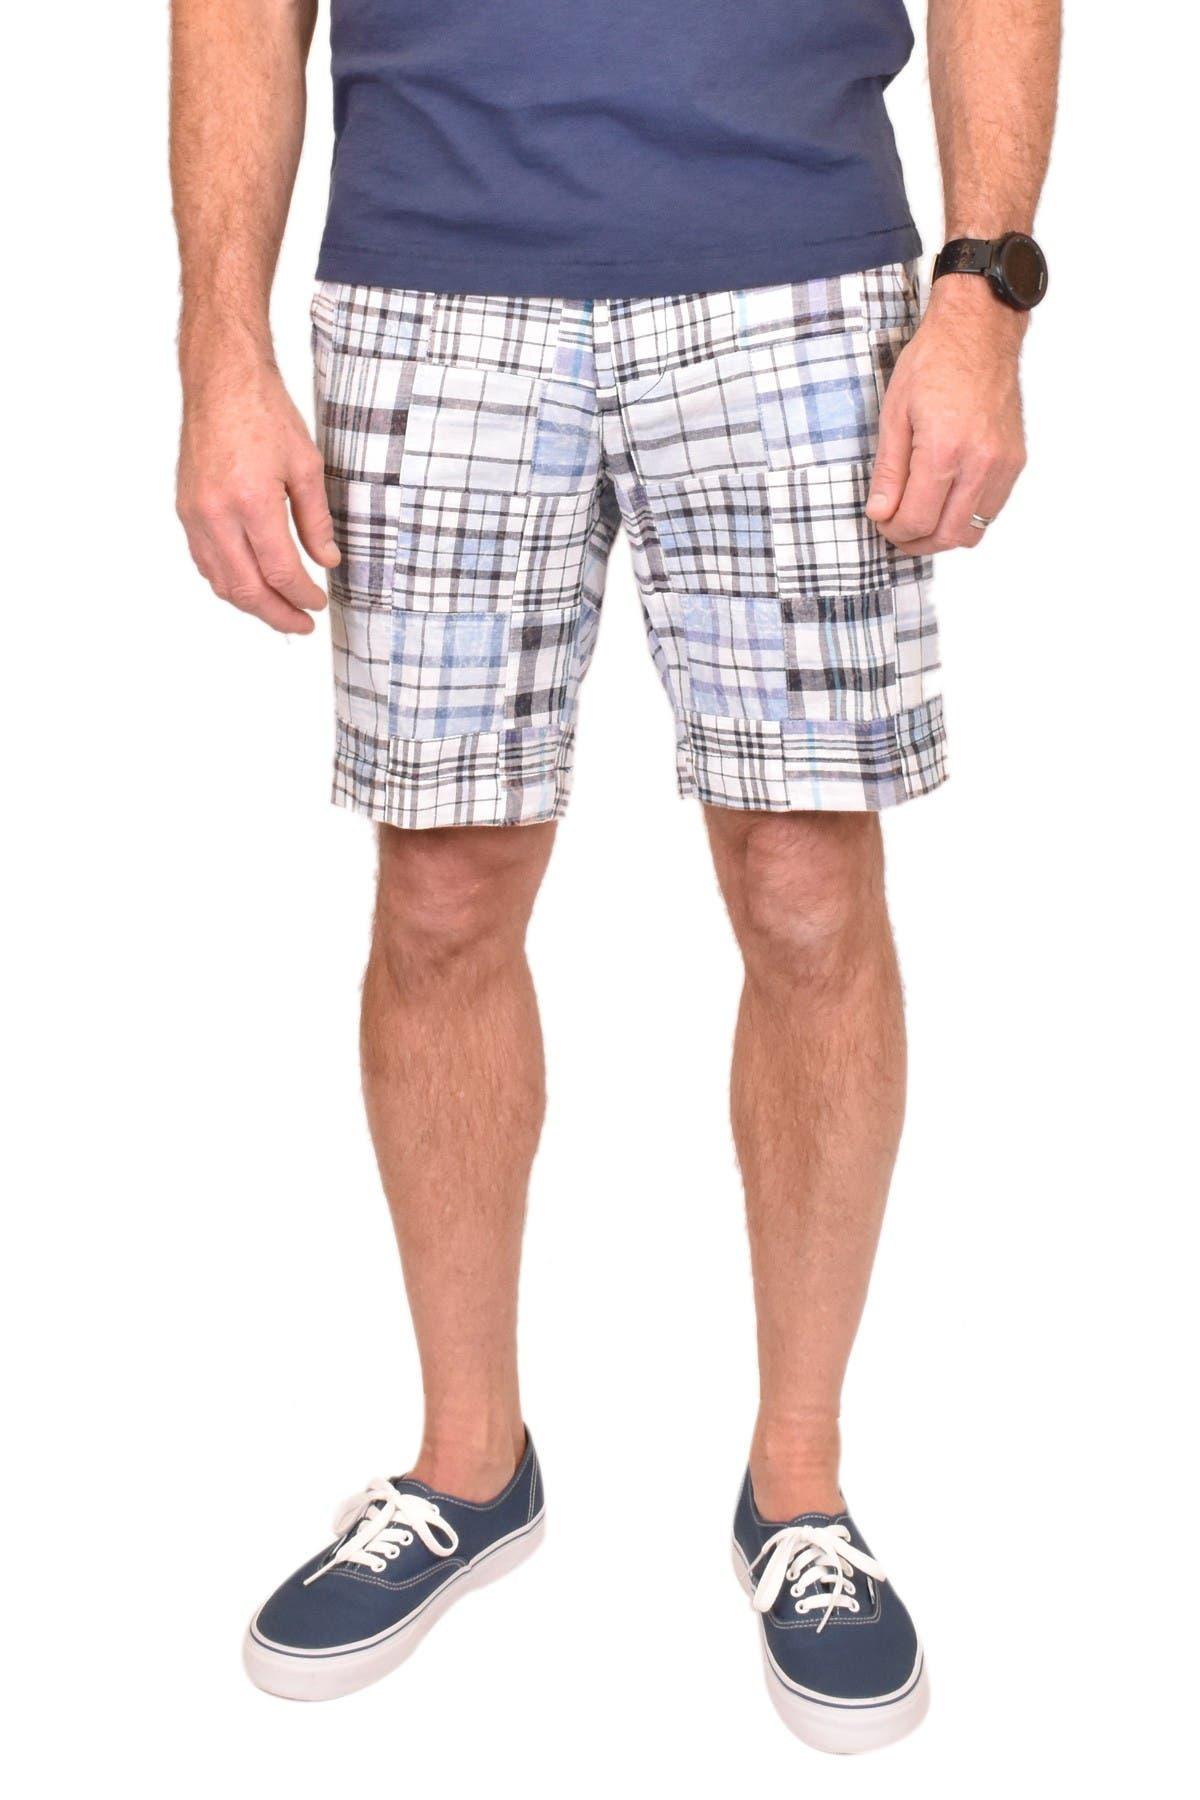 Vintage Shorts 1946 PATCH MADRAS PRINT FLAT FRONT SHORTS